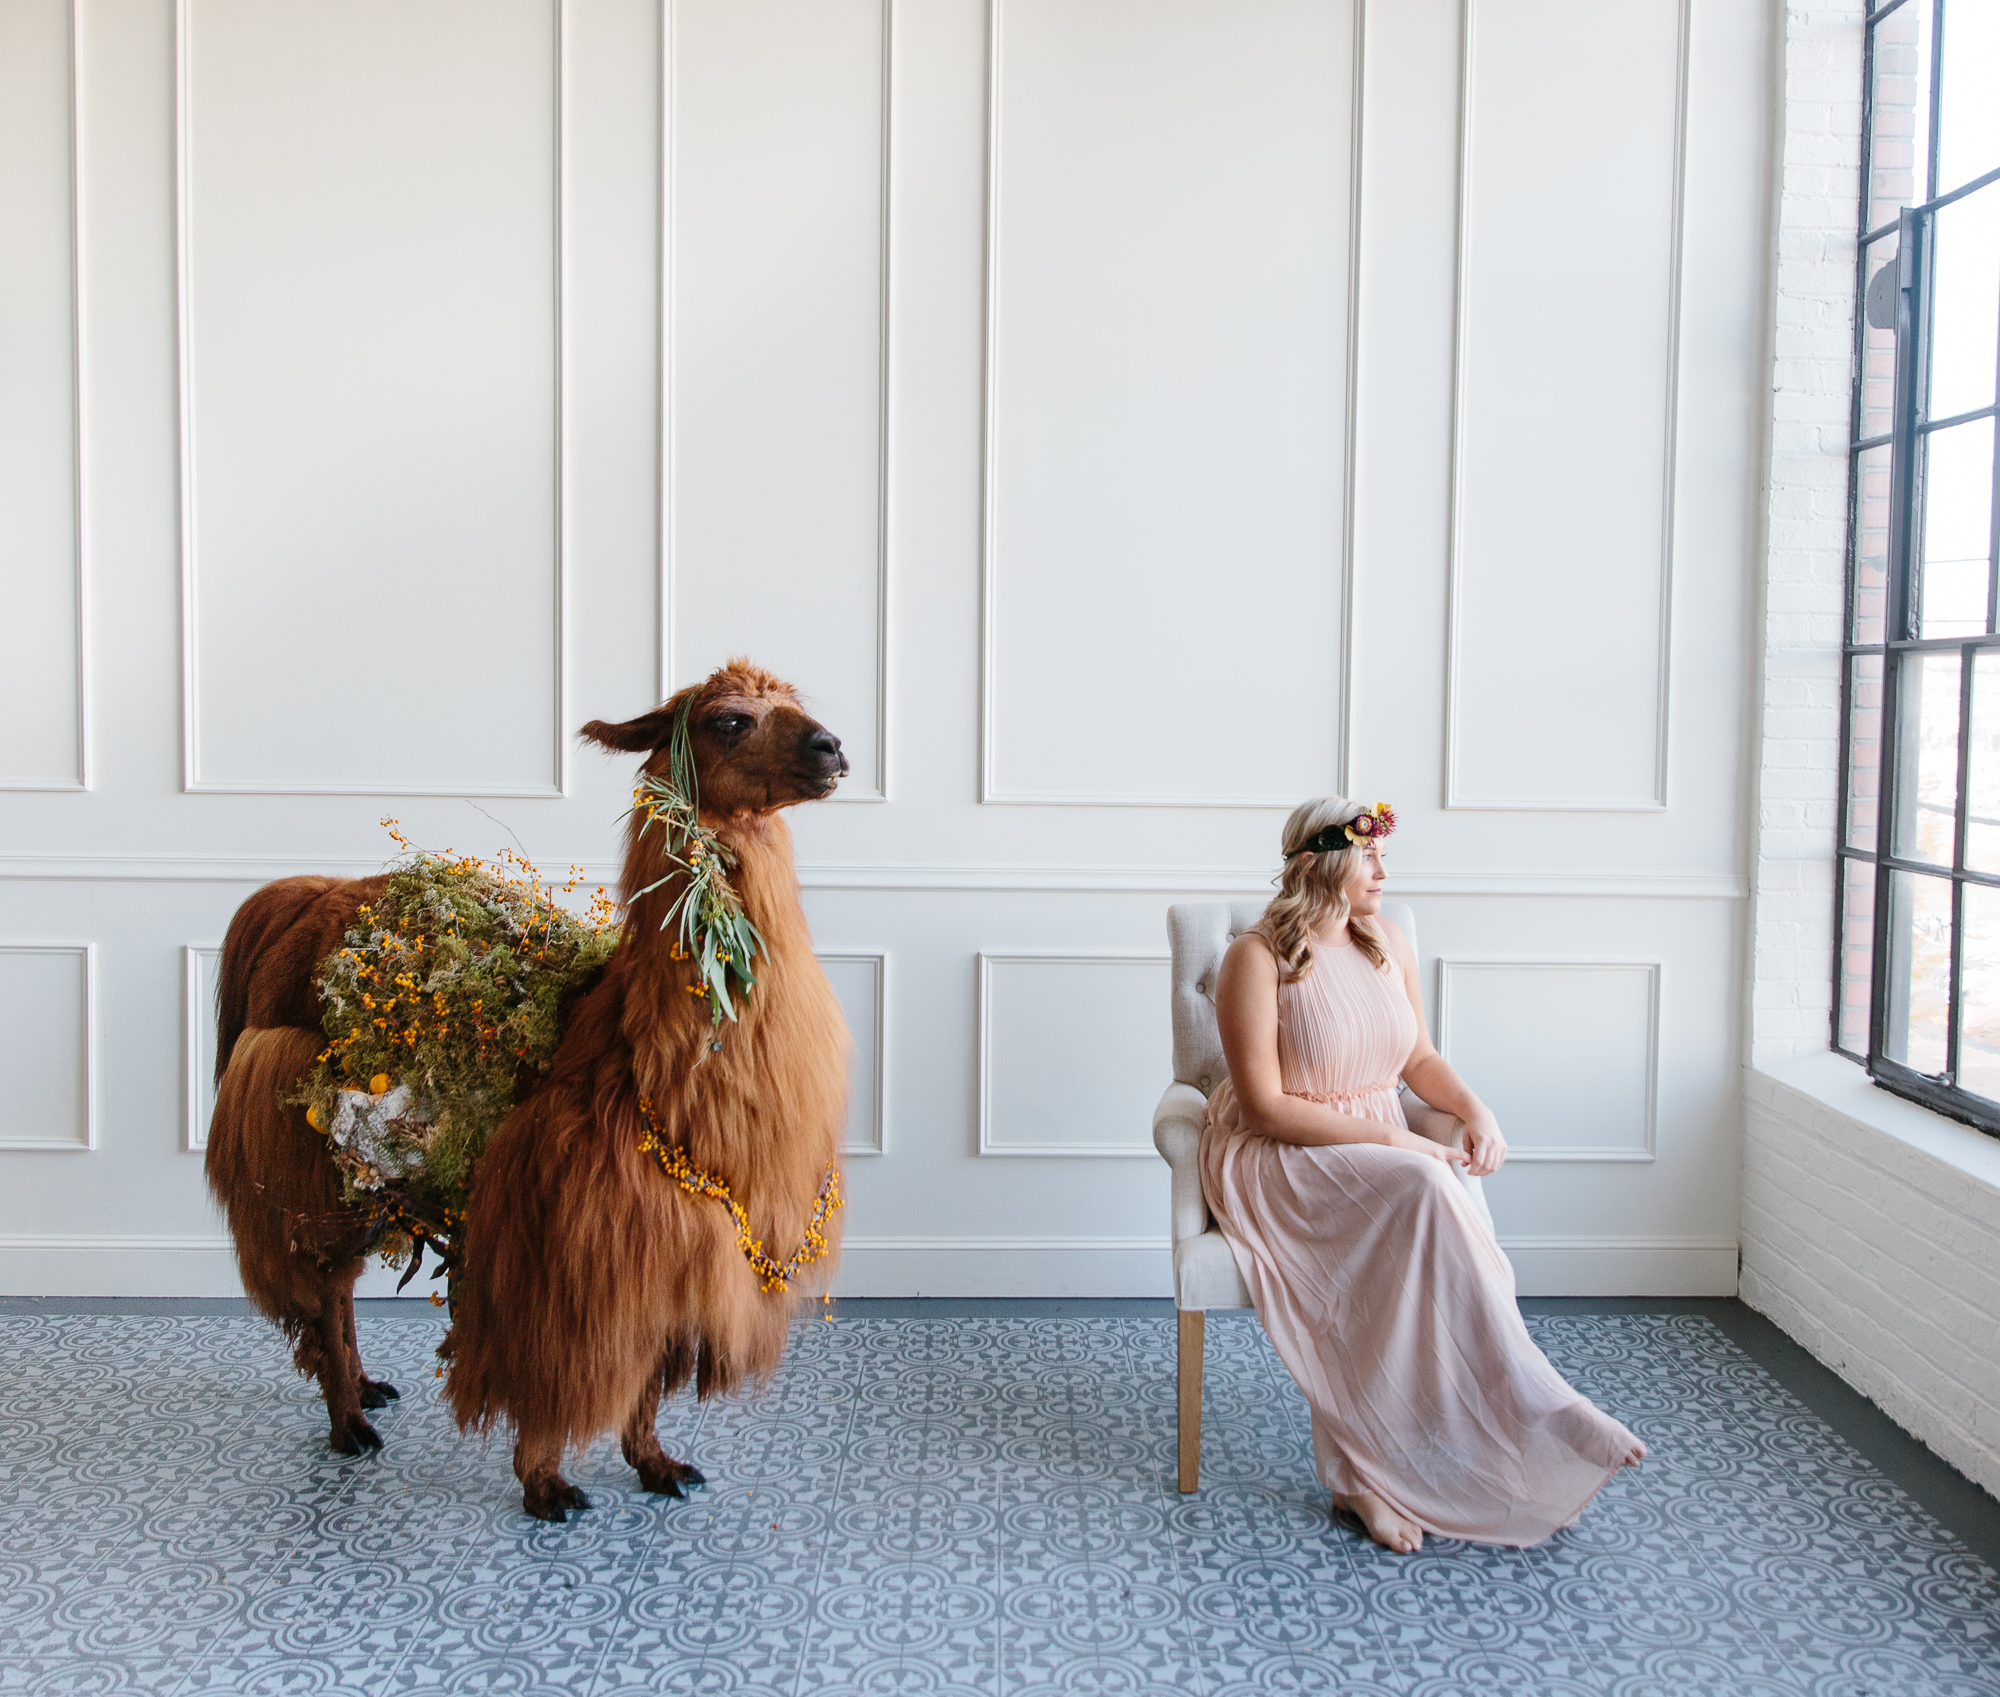 llama_portland_animal-21.JPG